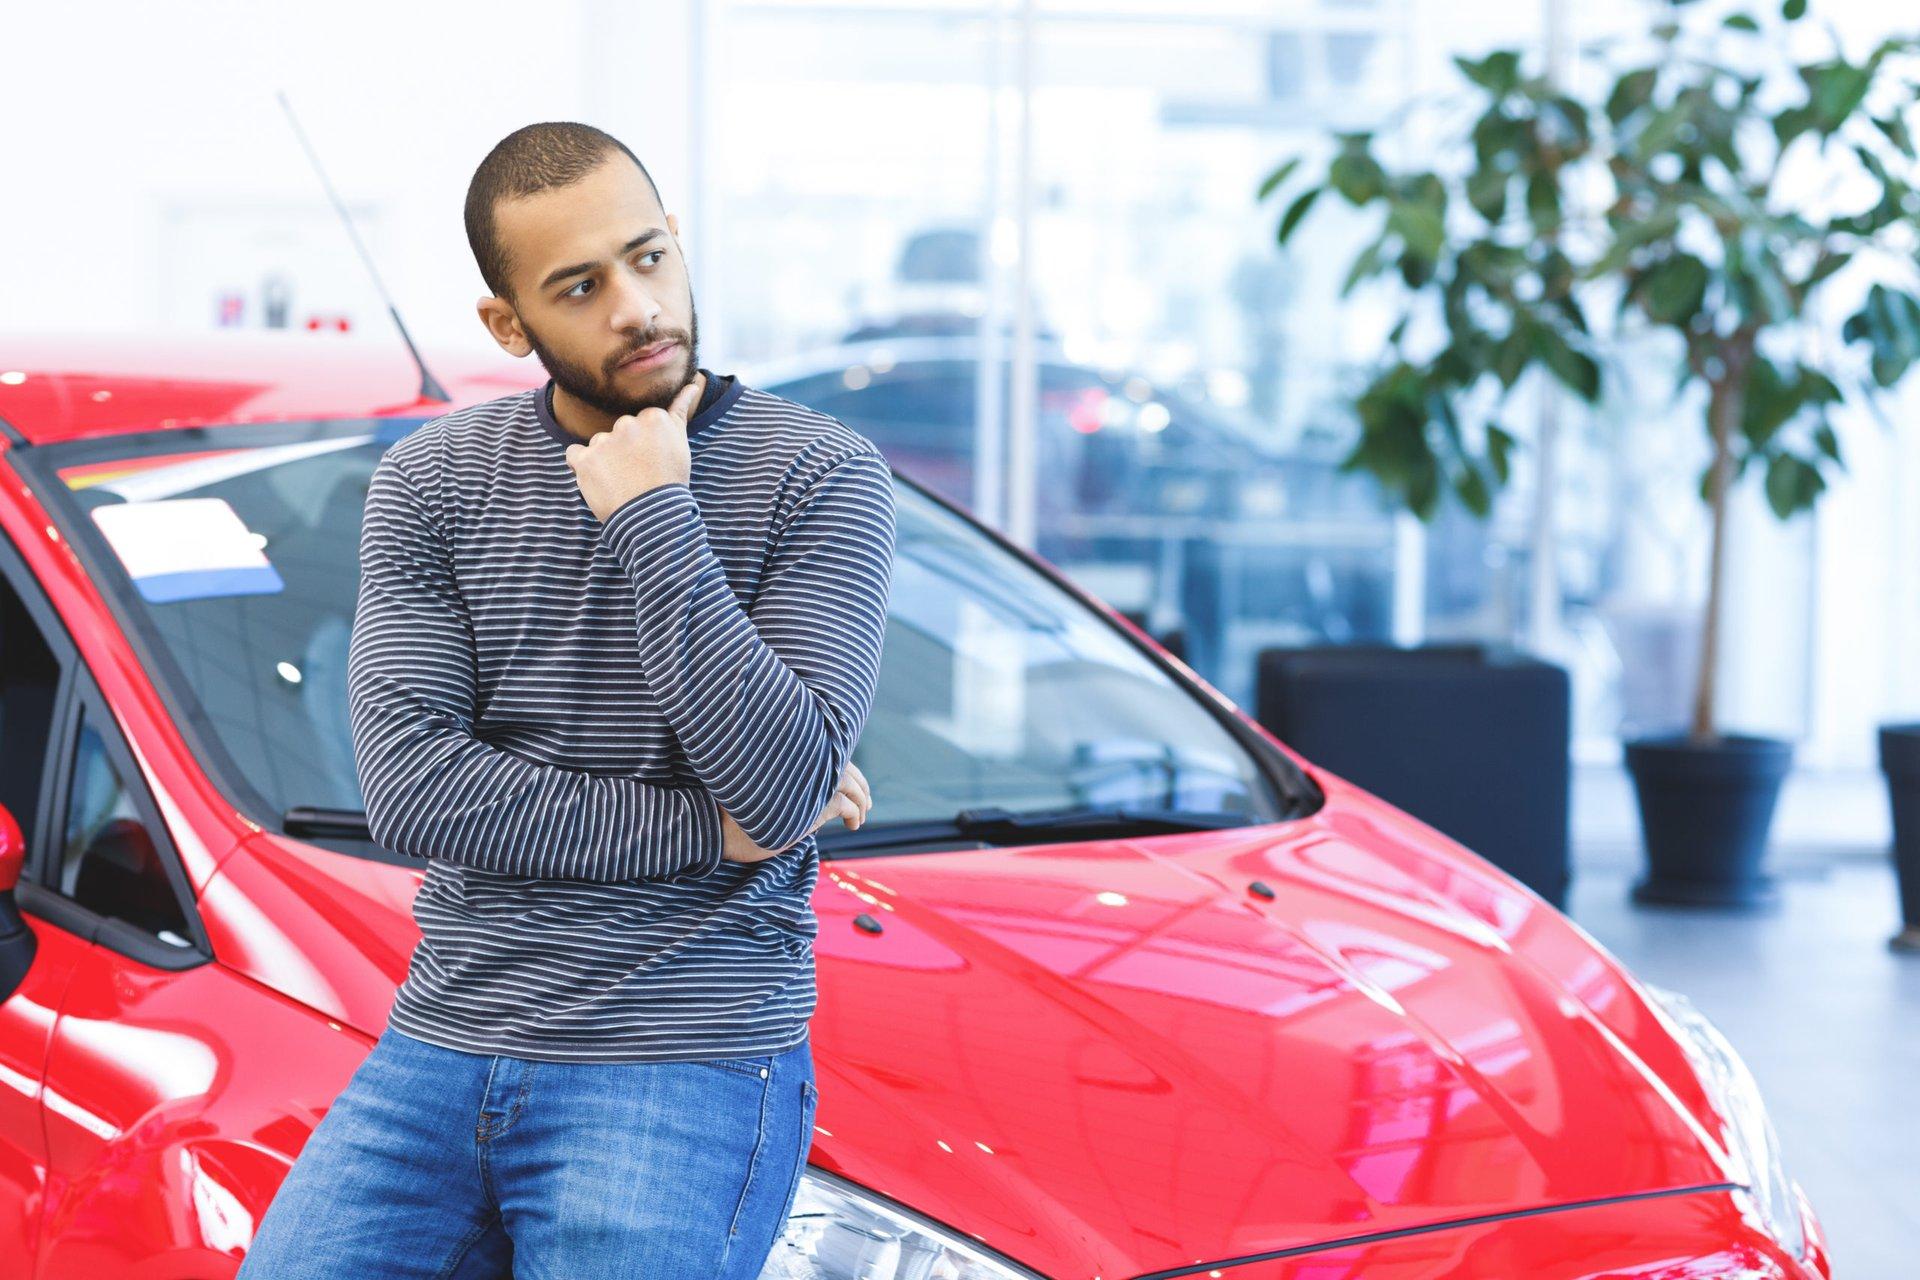 Car shopper unsure about depreciation